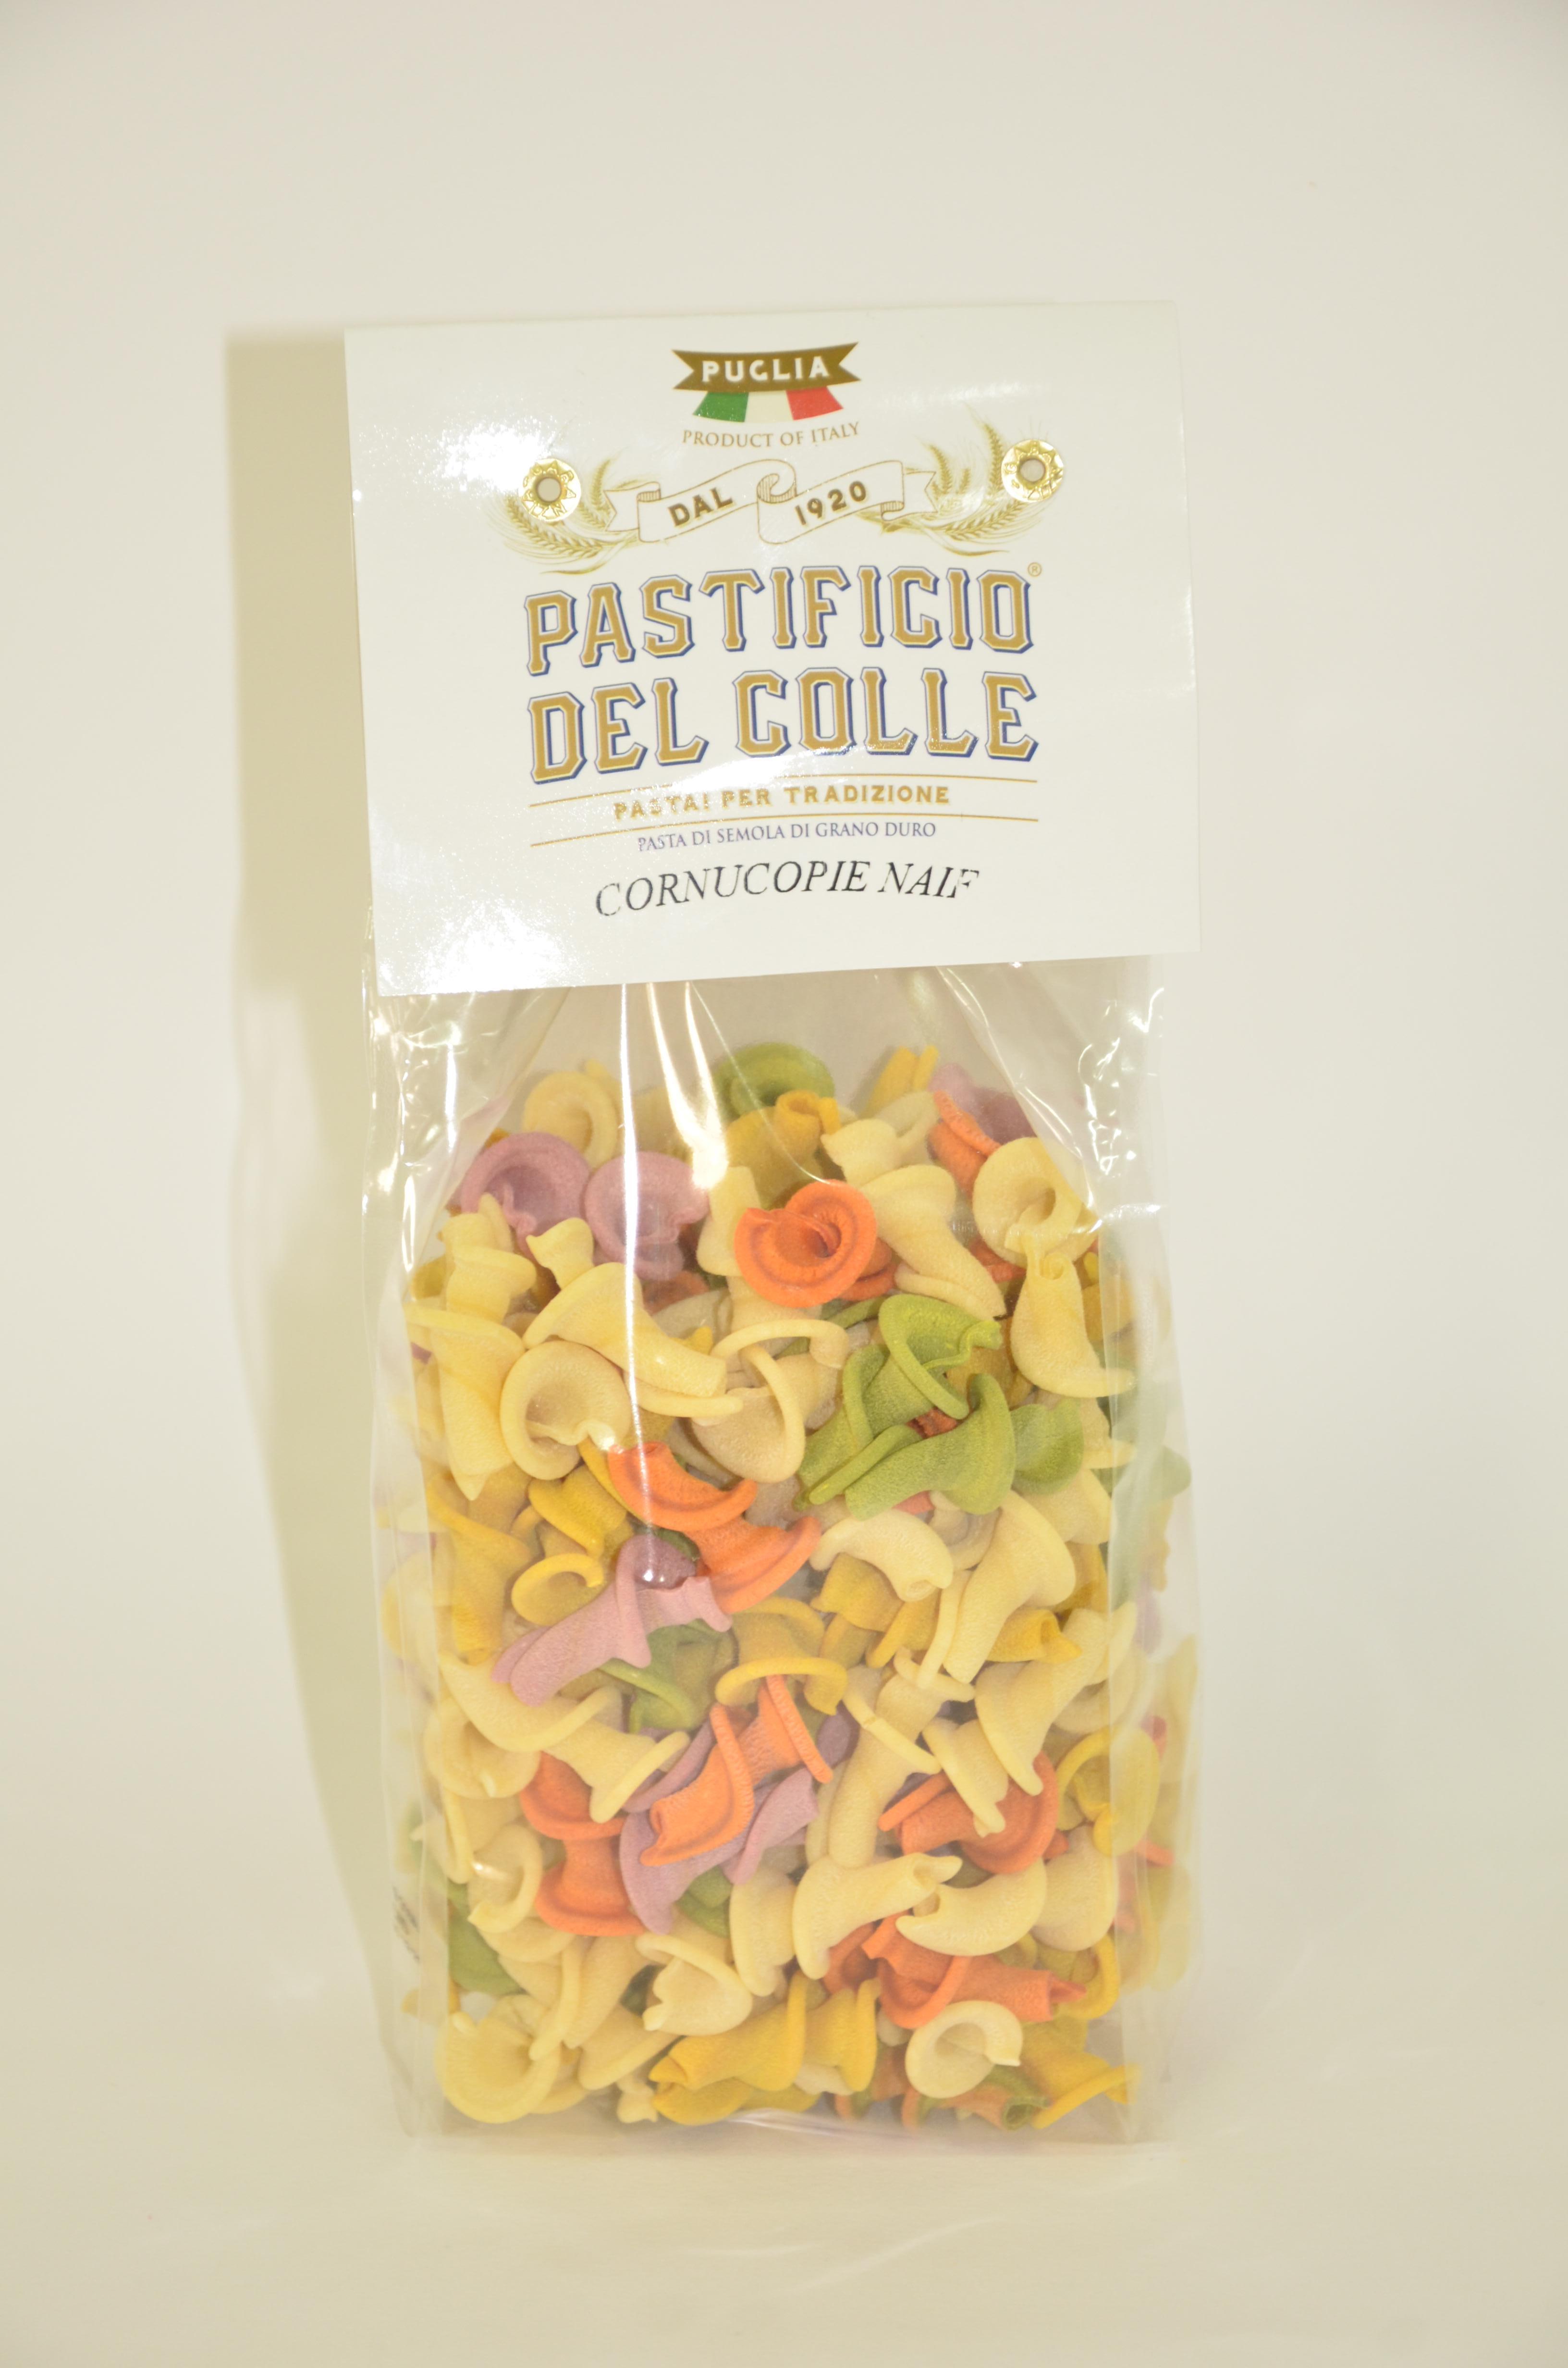 Макароны из твердых сортов пшеницы Cornucopie naif Pastificio del Colle